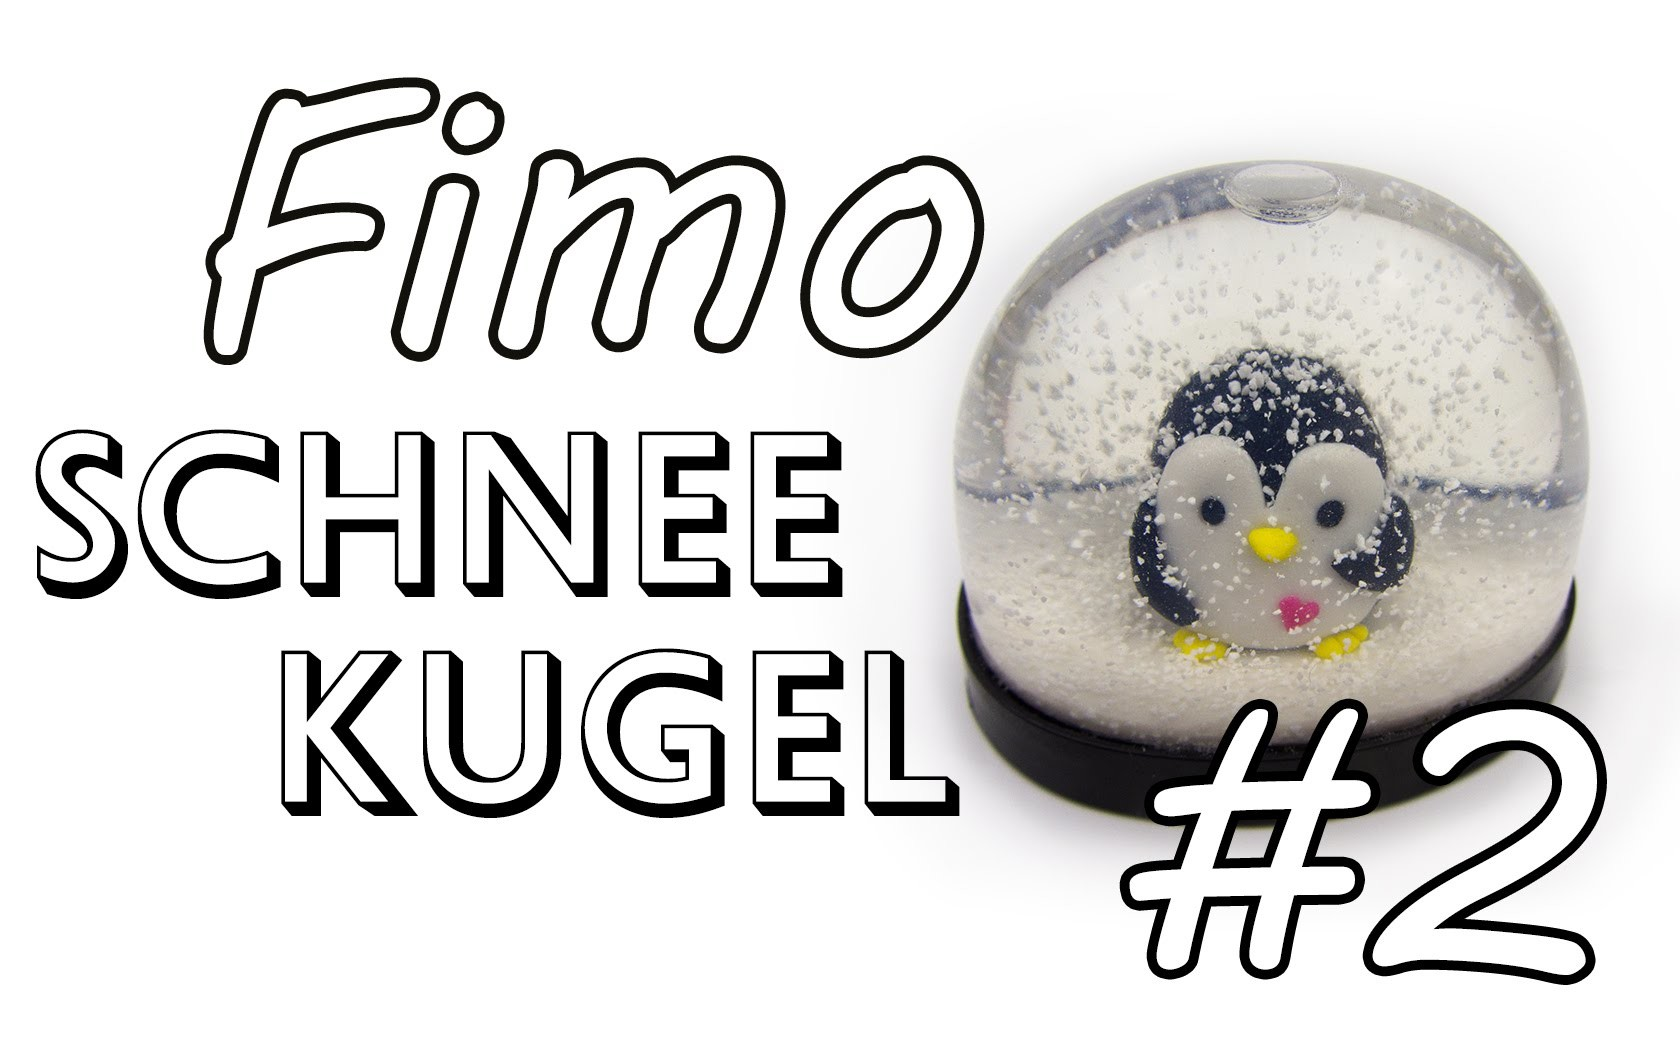 Fimo Schneekugel #2 | DIY Geschenk Ideen #07 | Weihnachts-Serie 2014